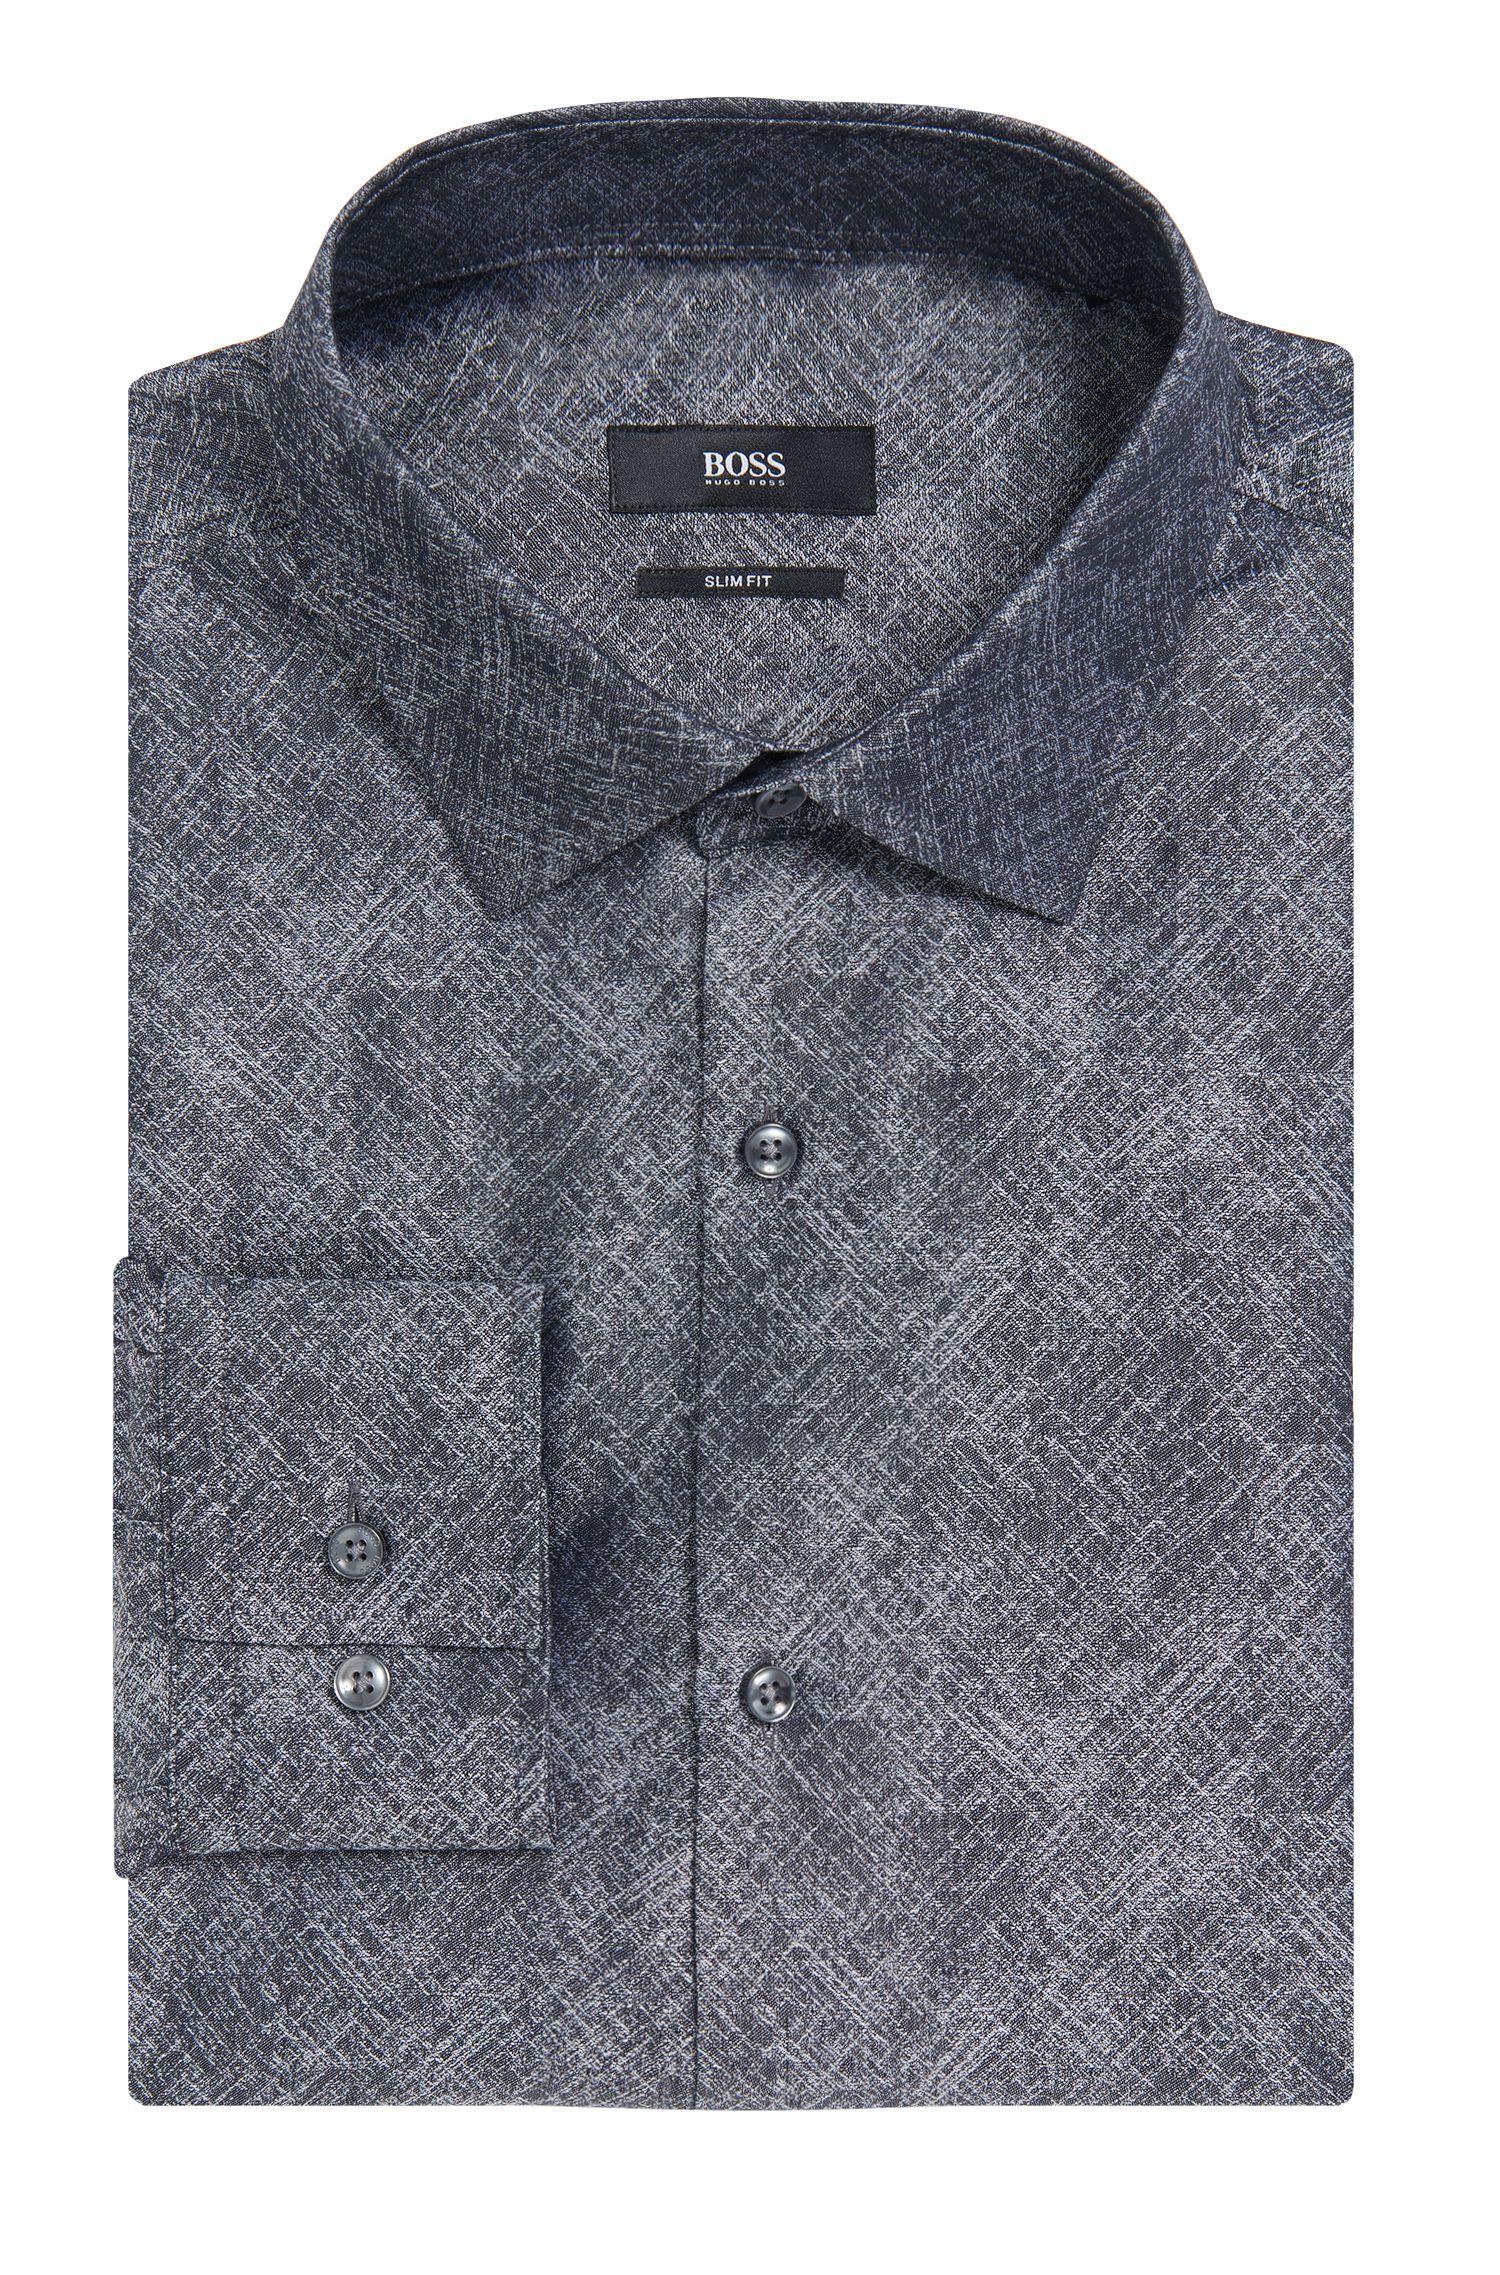 Crosshatch Italian Cotton Dress Shirt, Slim Fit | Jenno